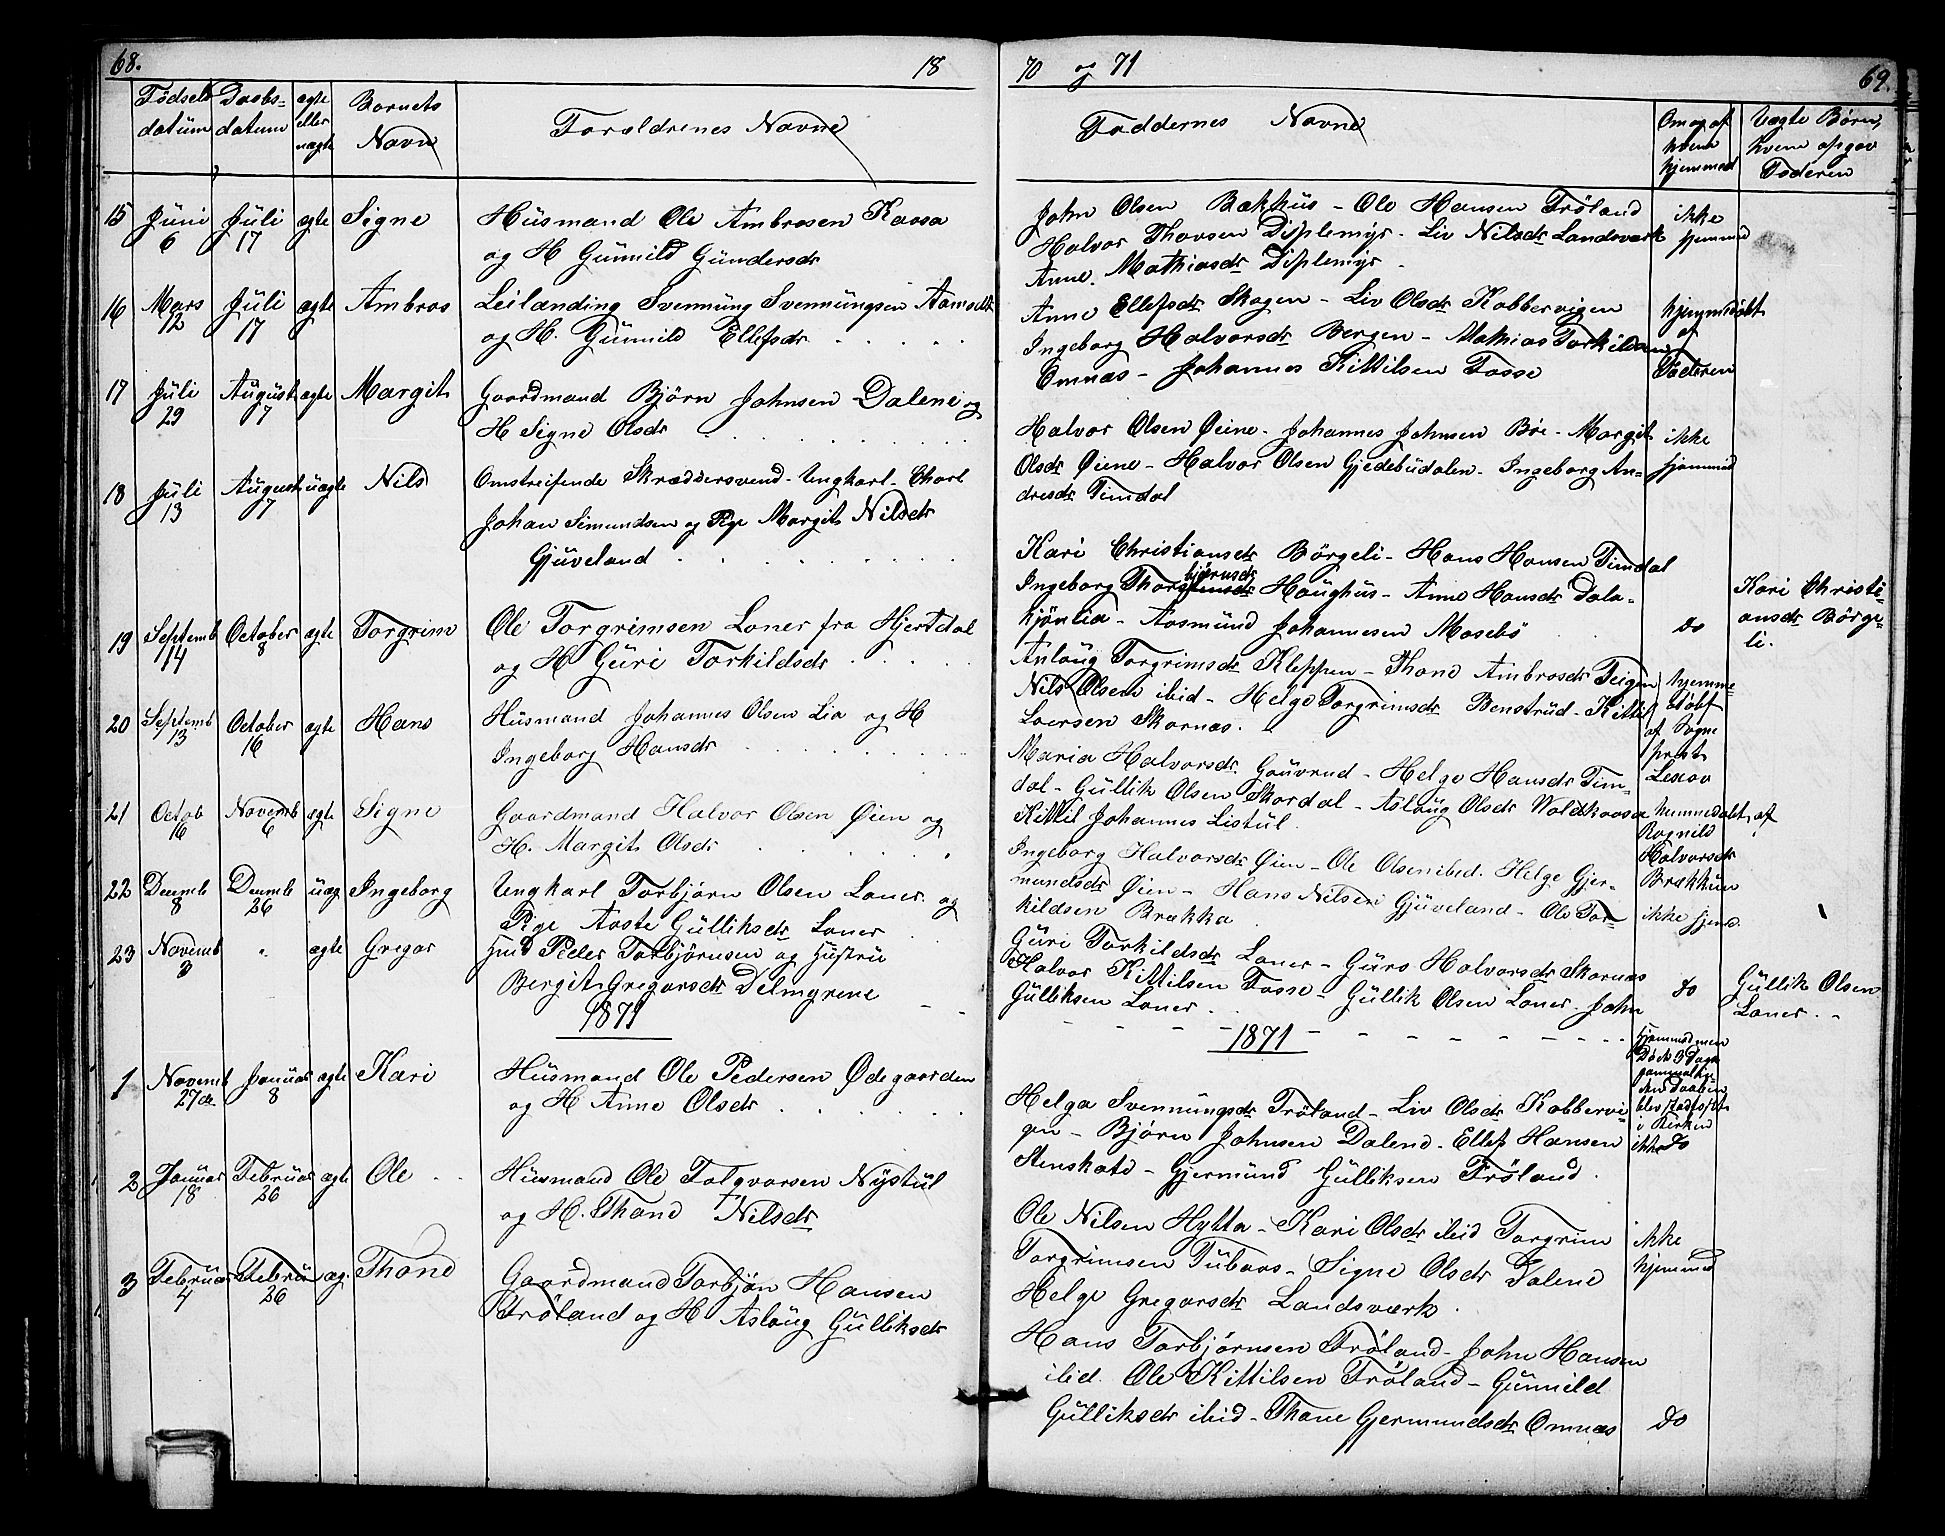 SAKO, Hjartdal kirkebøker, G/Gb/L0002: Klokkerbok nr. II 2, 1854-1884, s. 68-69